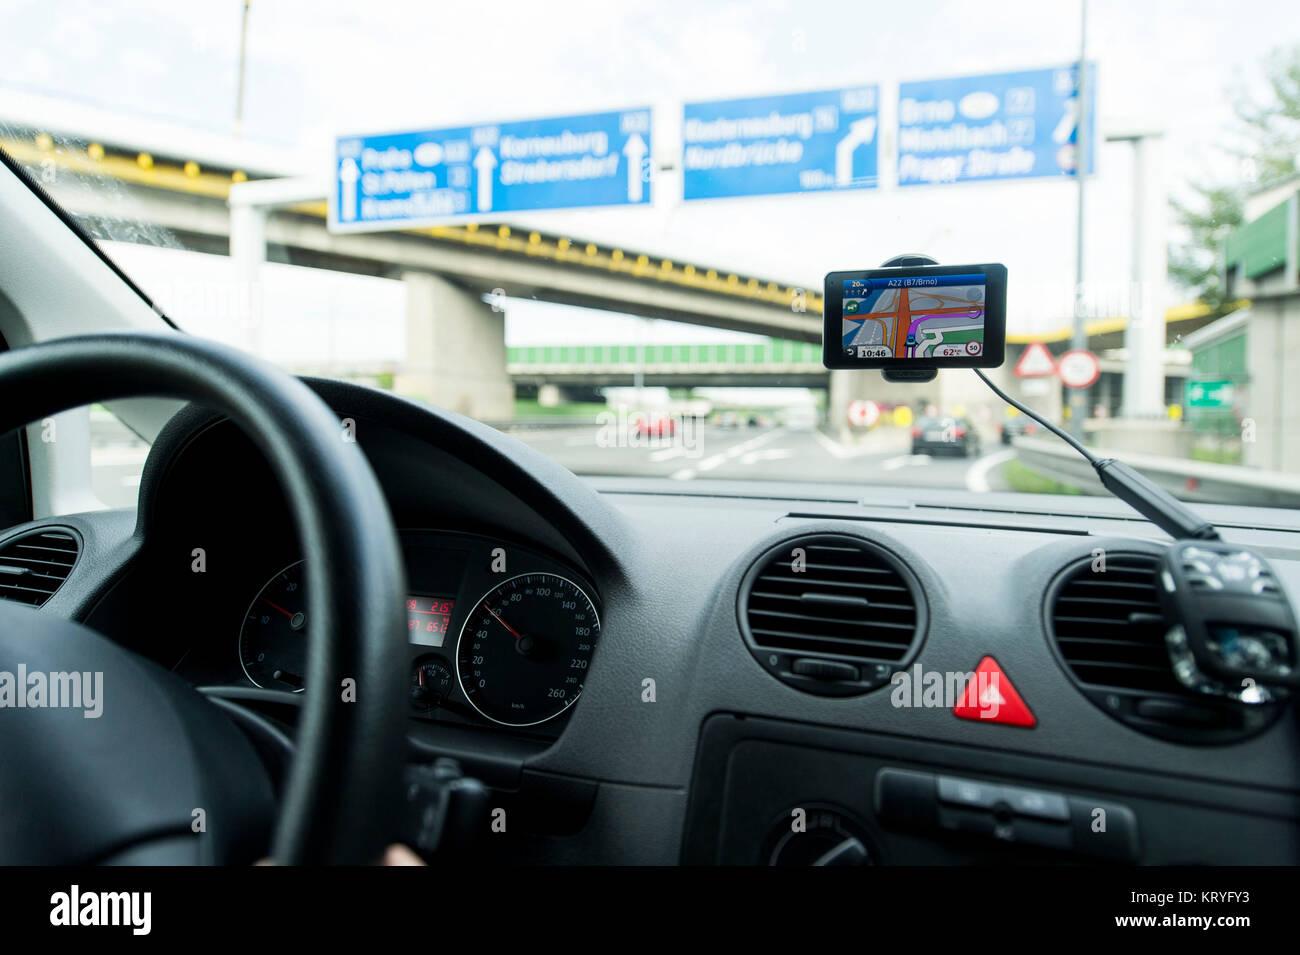 Autofahrt mit Navigationsgerät, Österreich - car ride with navigation - Stock Image